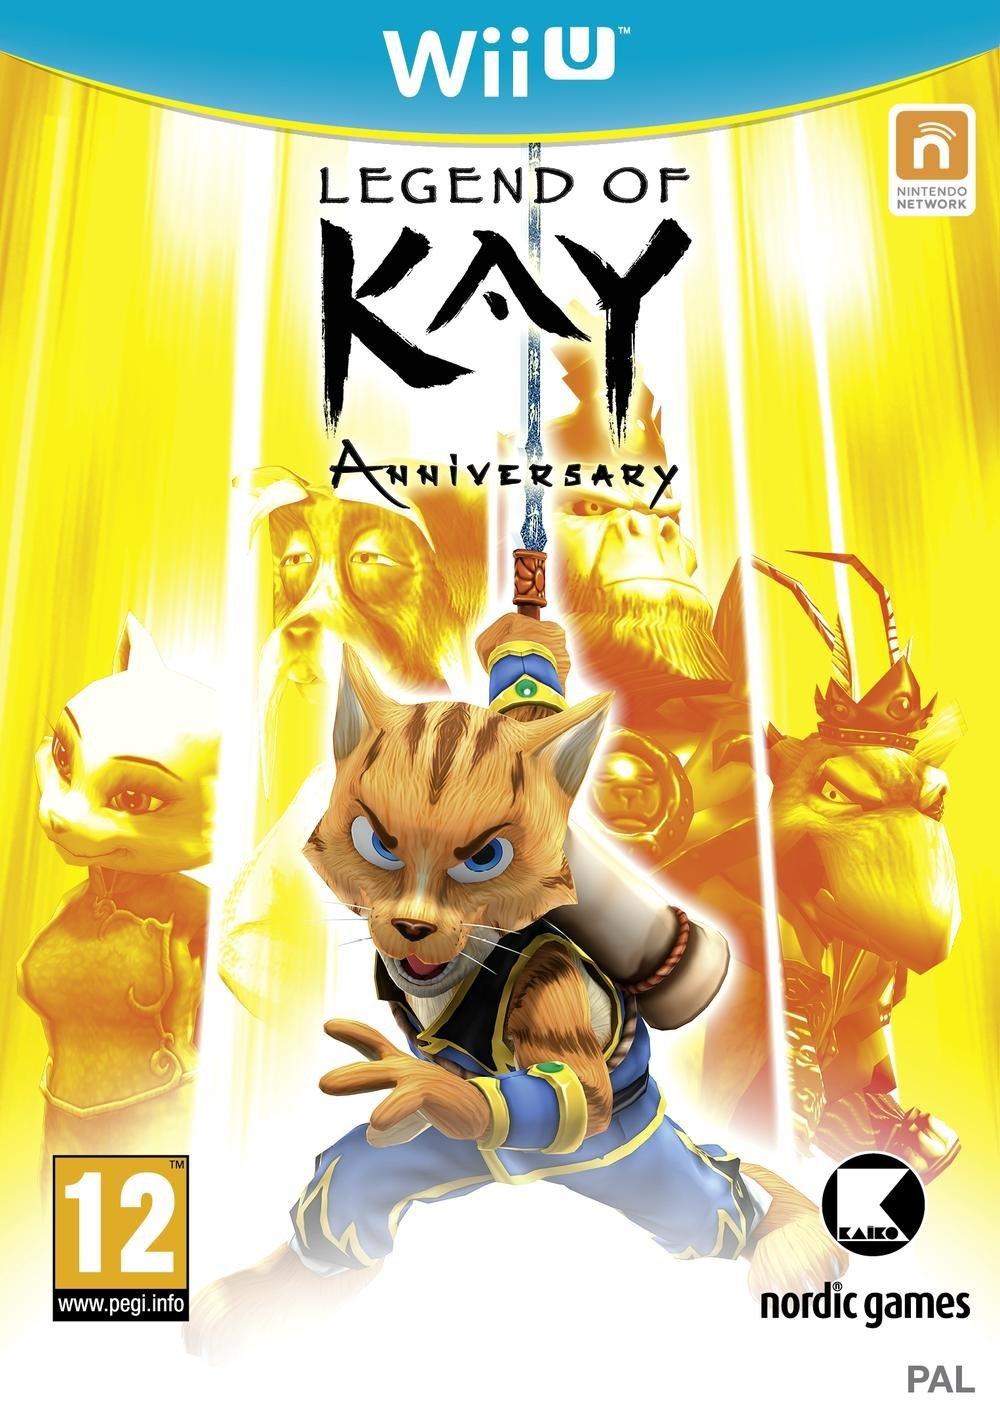 Legend of Kay WIIU